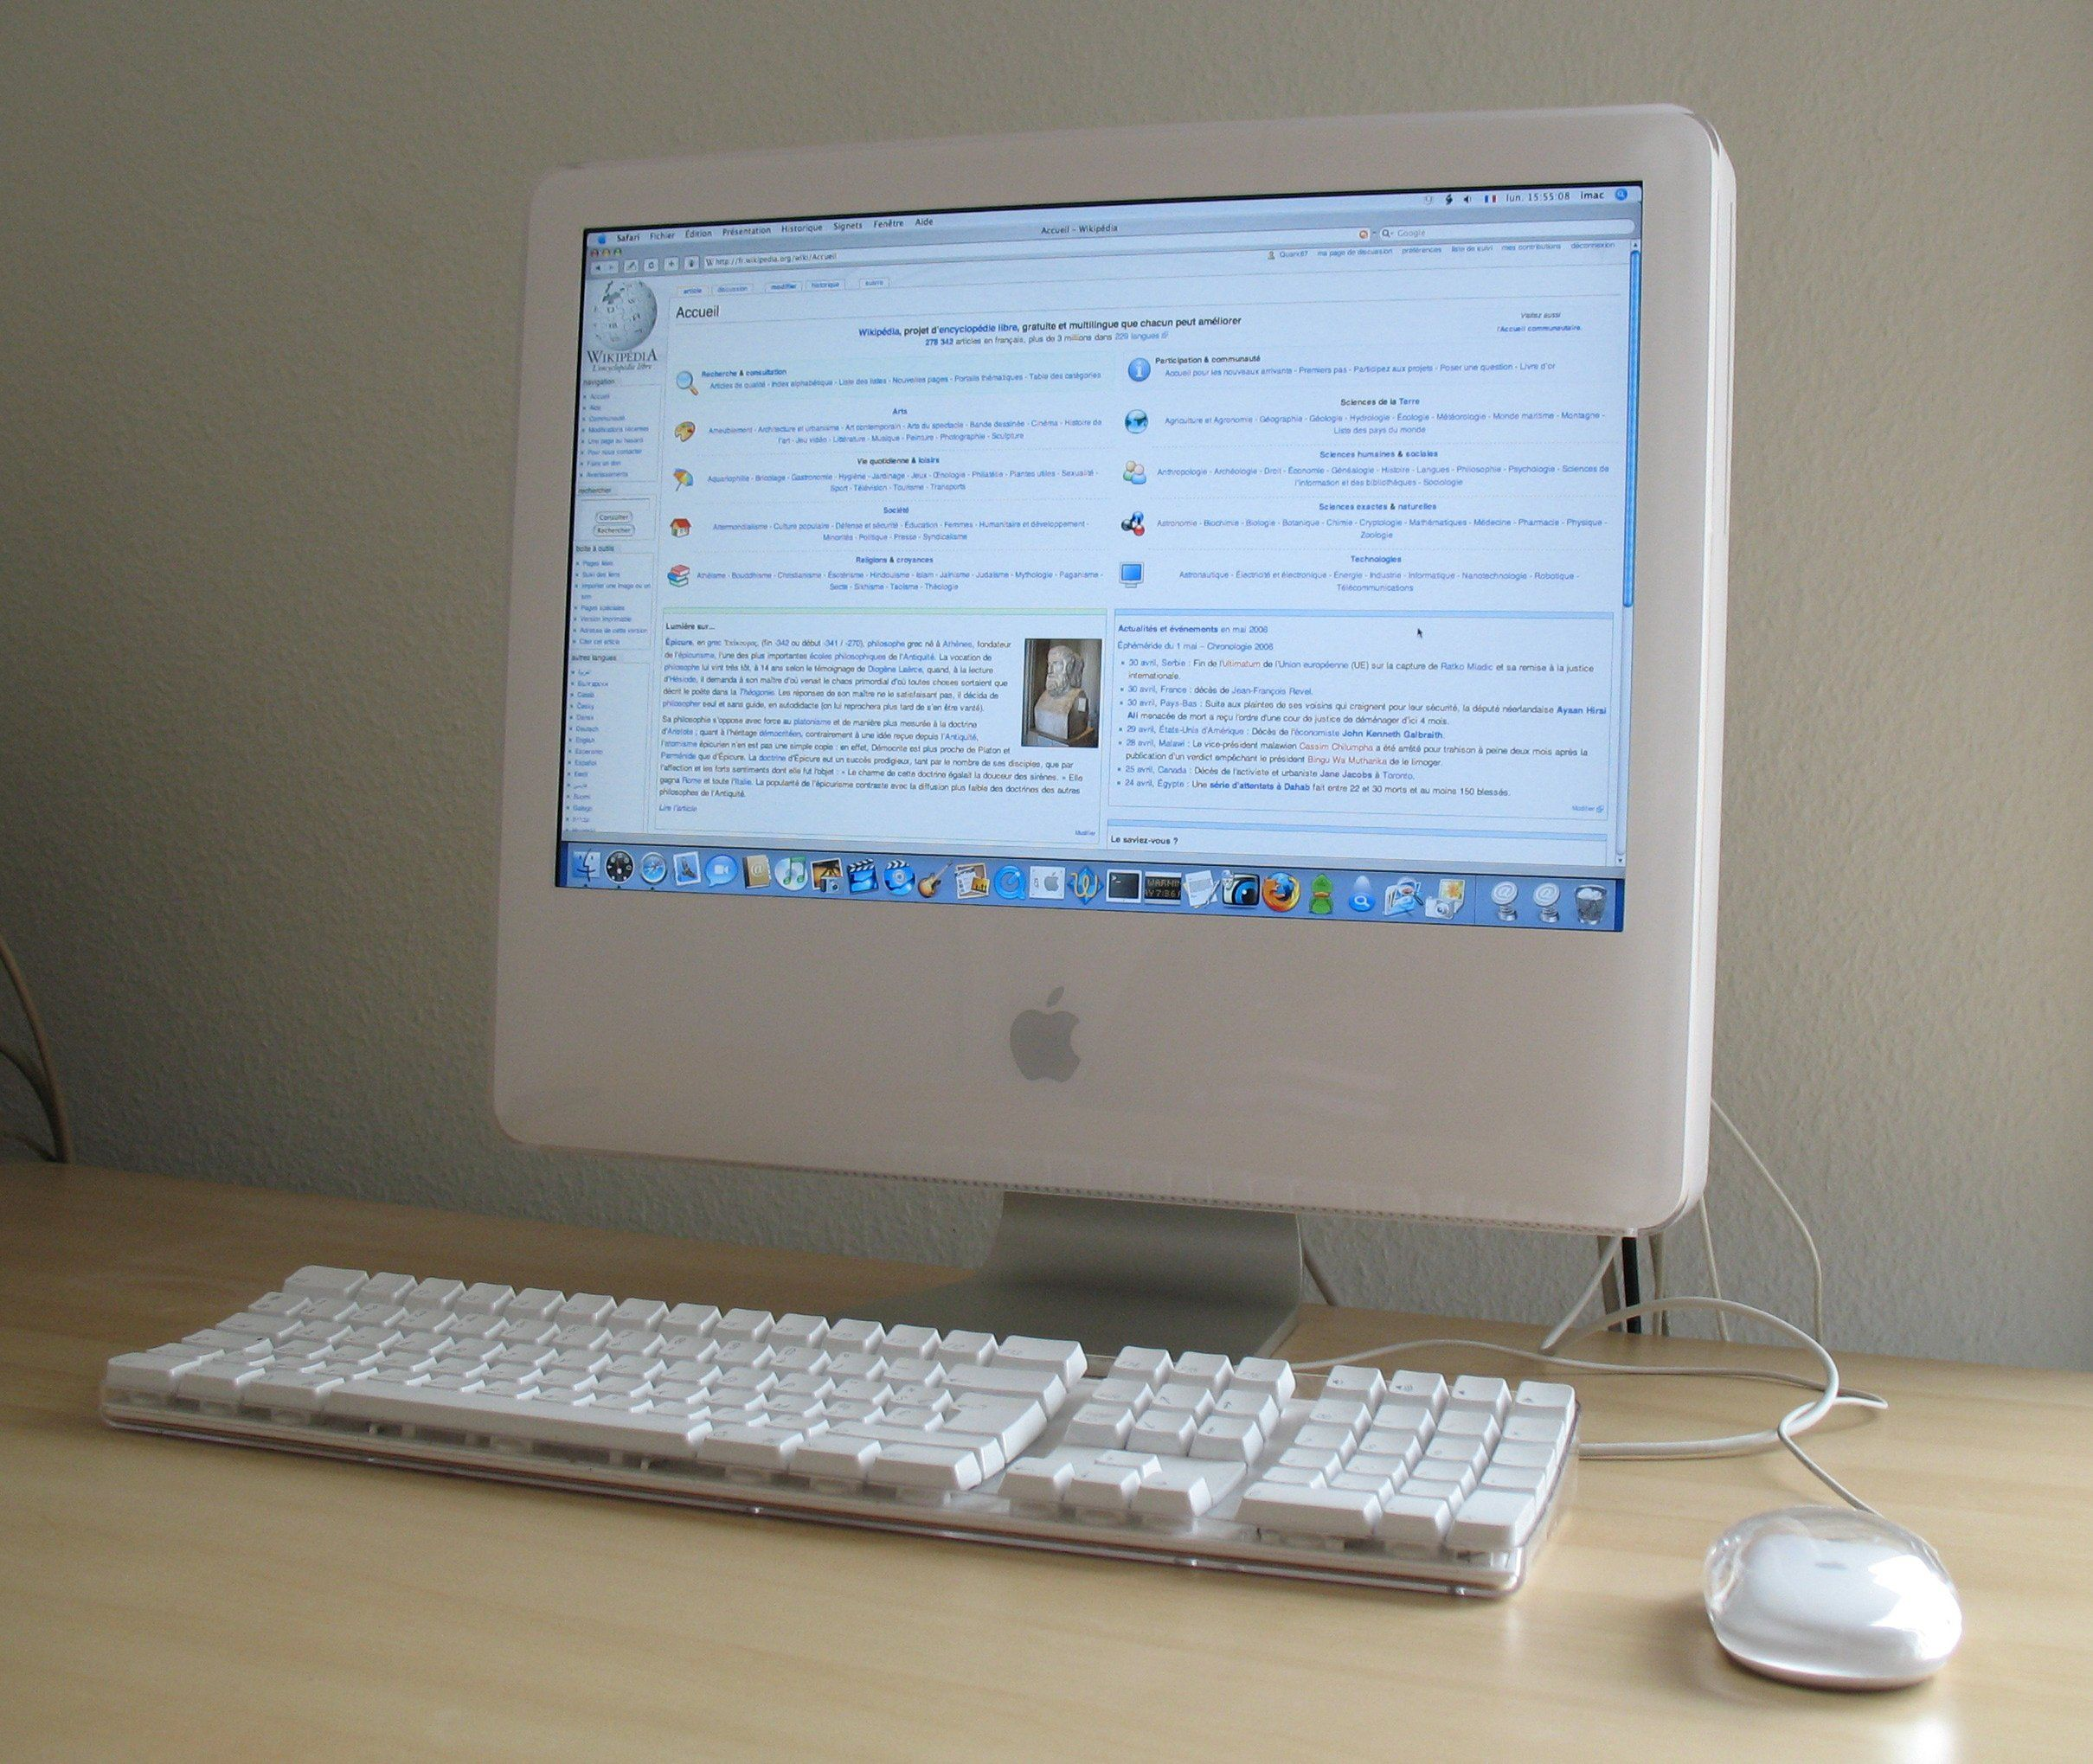 imac g5 20 1st generation this was me nicole s 1st major rh pinterest com iMac G2 iMac G6